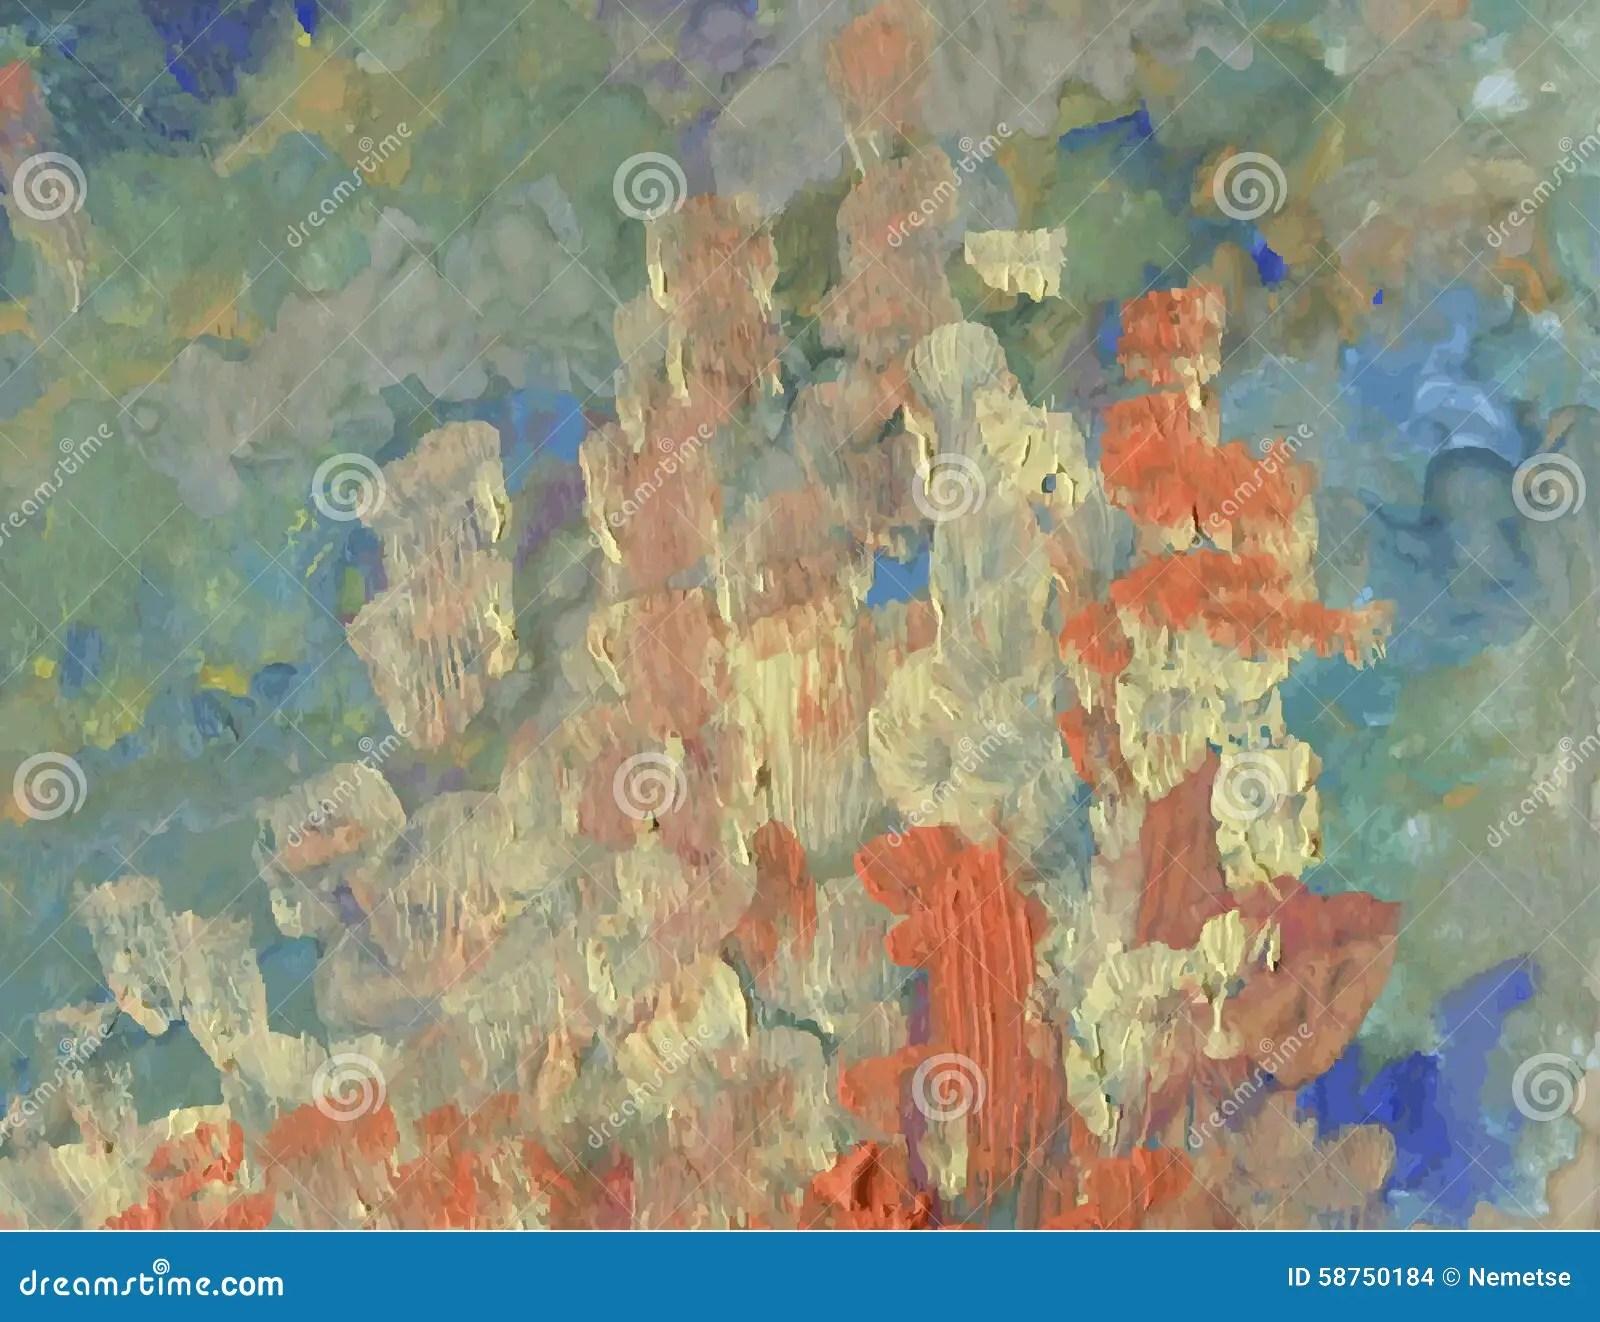 Paint Brush Strokes Graphics